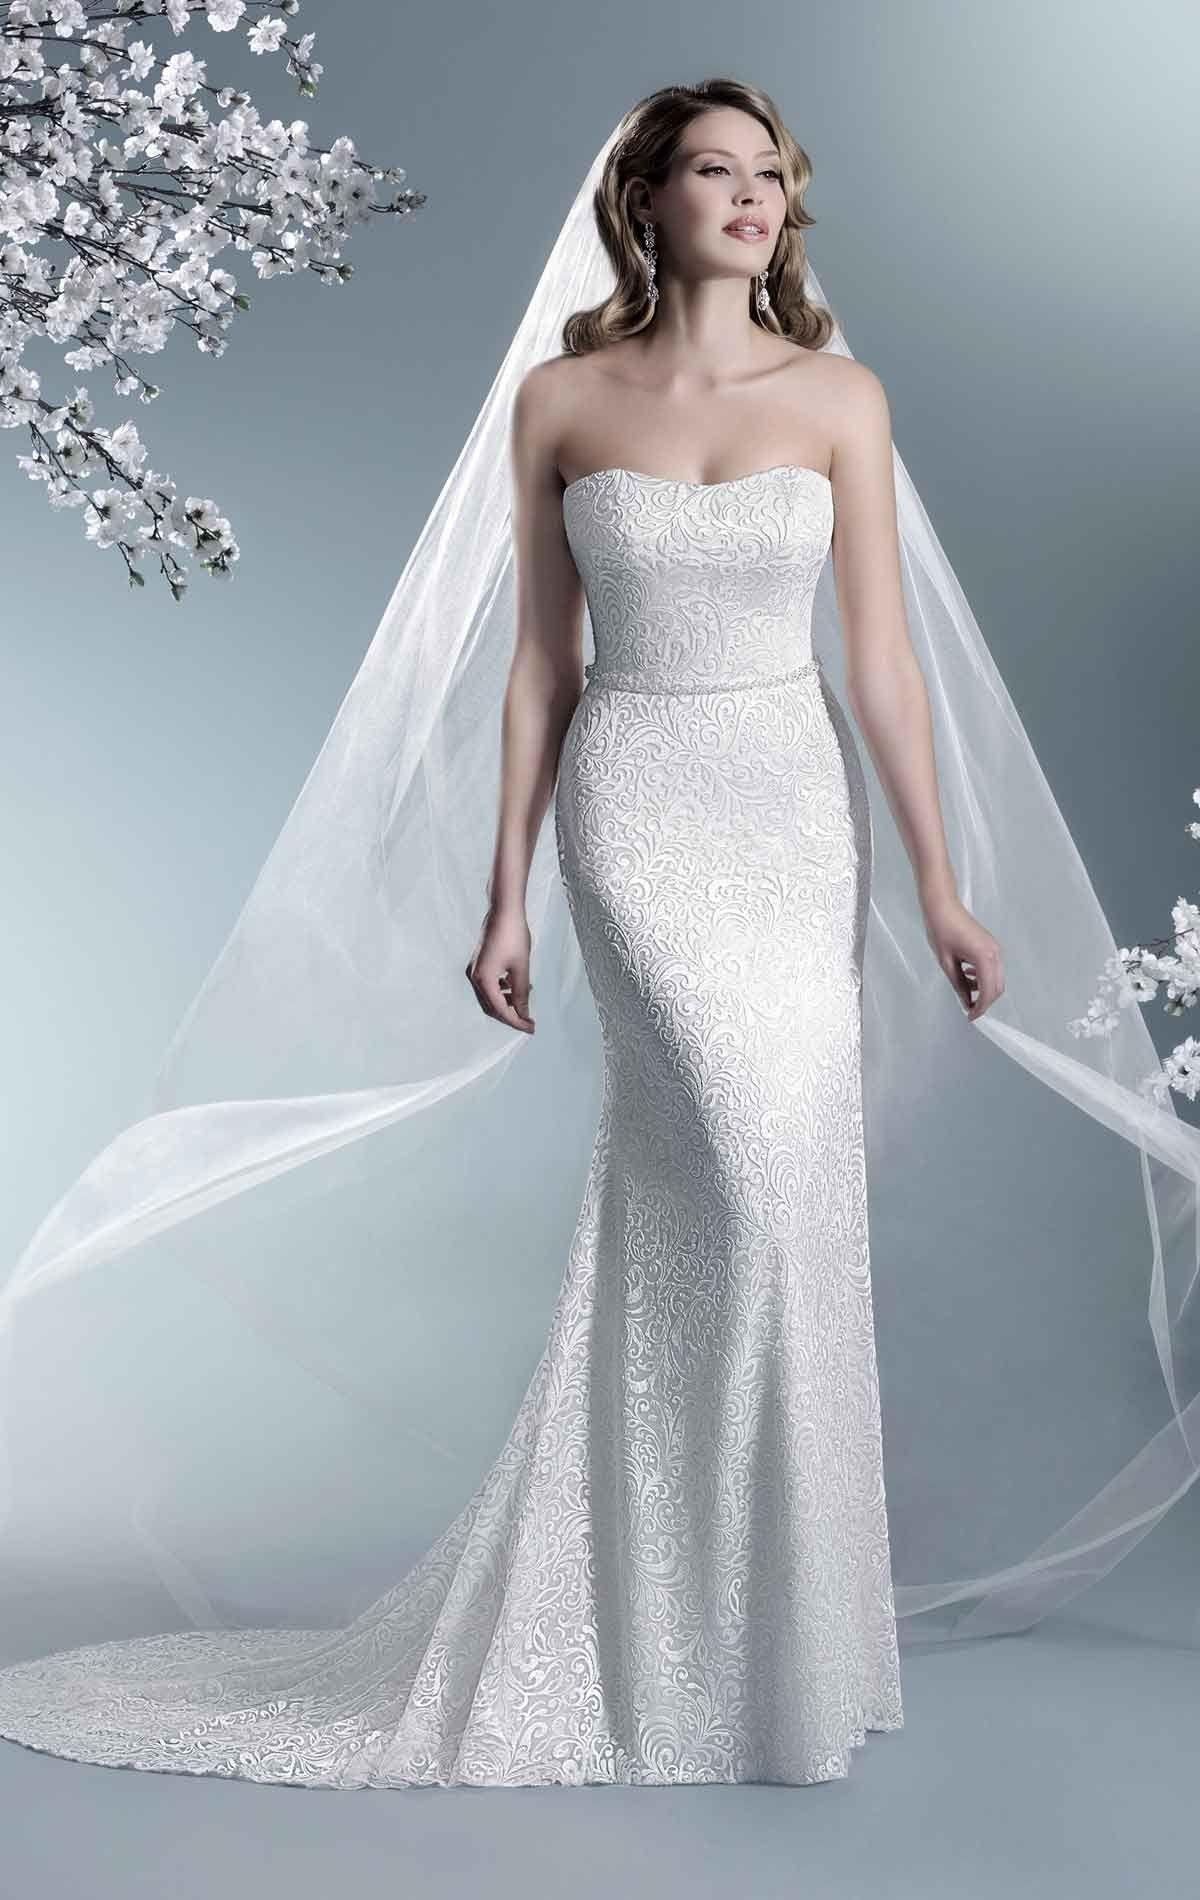 Dorable Wedding Dress Sample Sale Nyc Illustration - Colorful ...